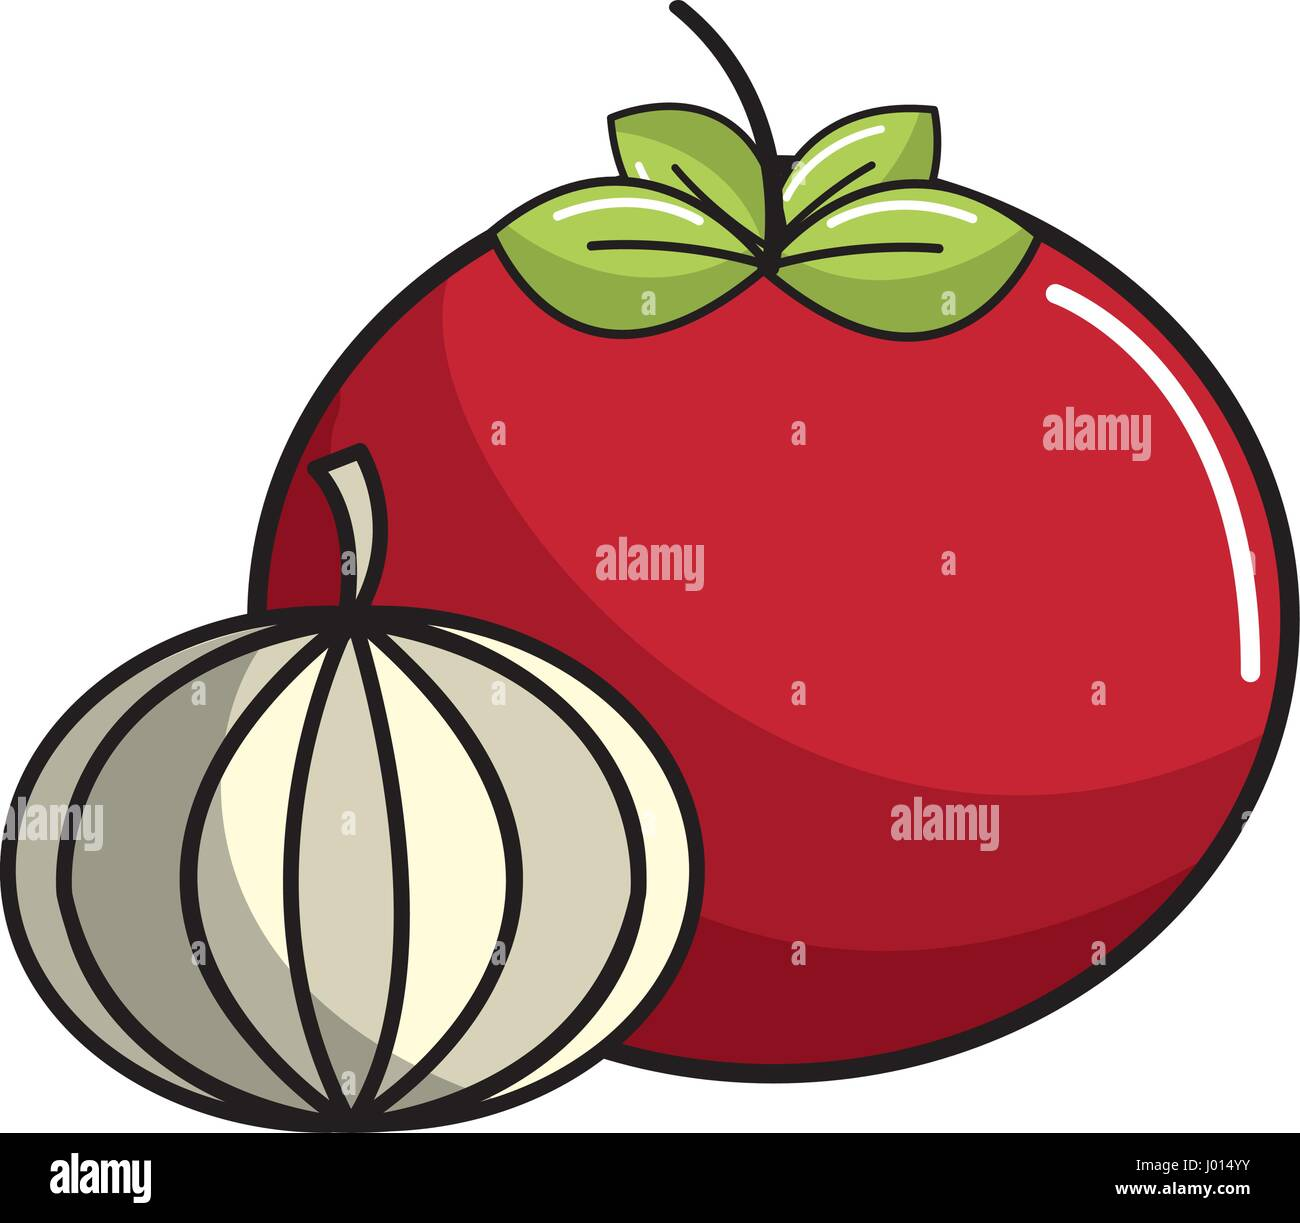 tomato and garlic vegetable icon - Stock Vector